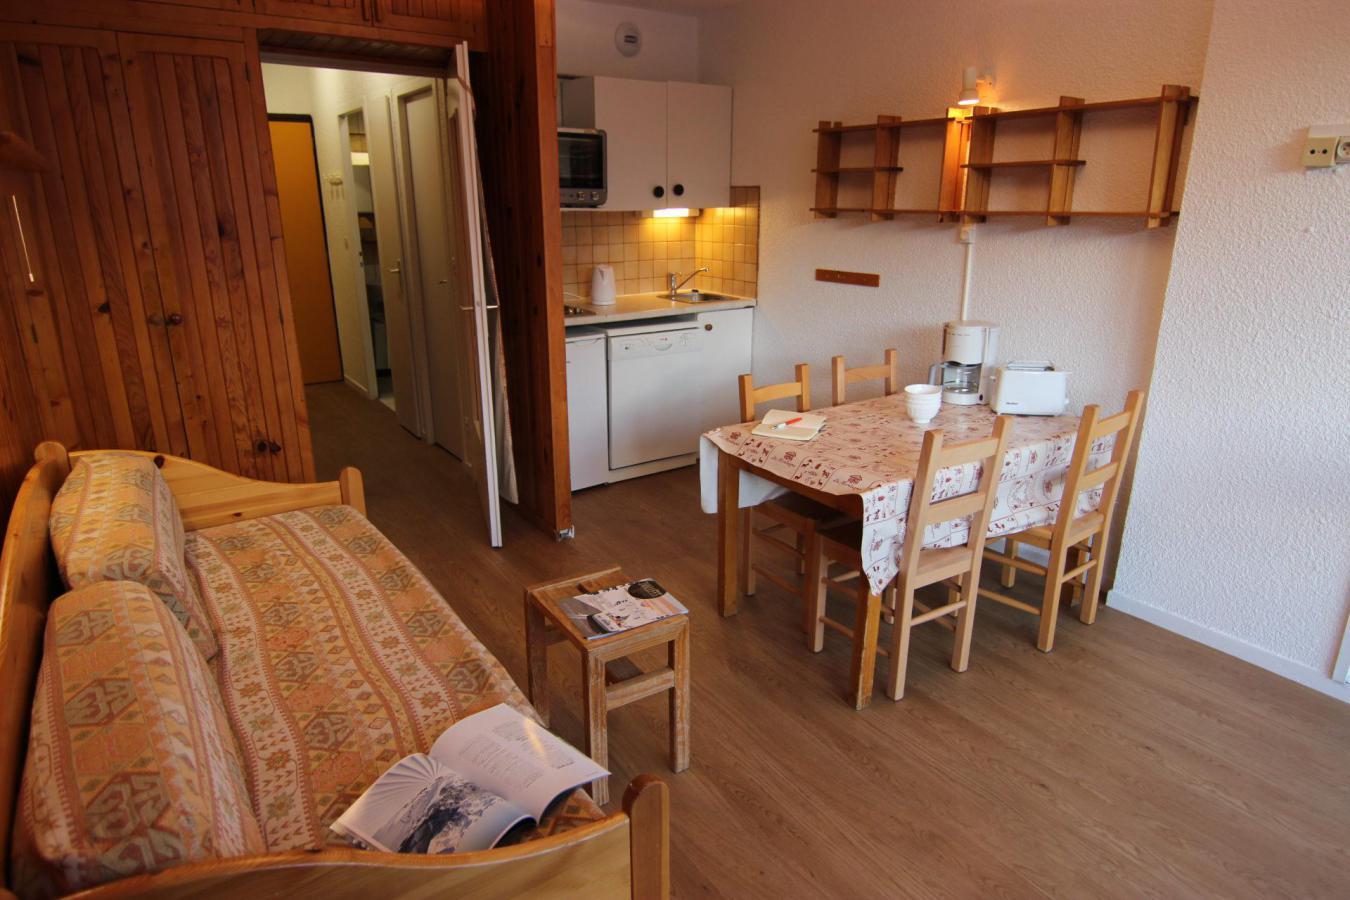 Location au ski Studio 4 personnes (10) - Residence Le Lac Du Lou - Val Thorens - Kitchenette